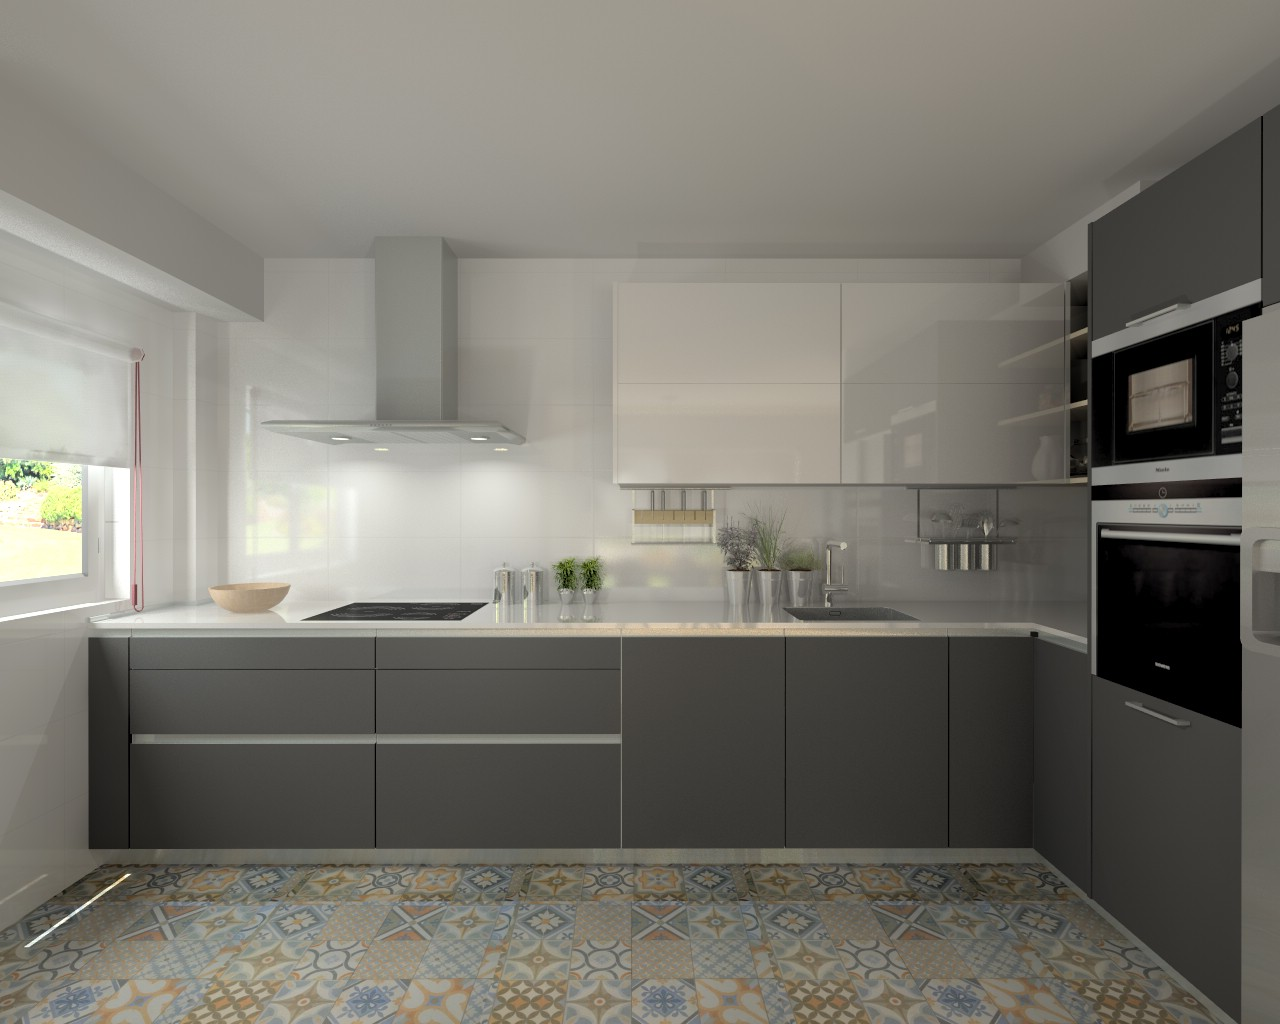 Muebles cocina gris ceniza 20170813053831 for Muebles blancos y grises